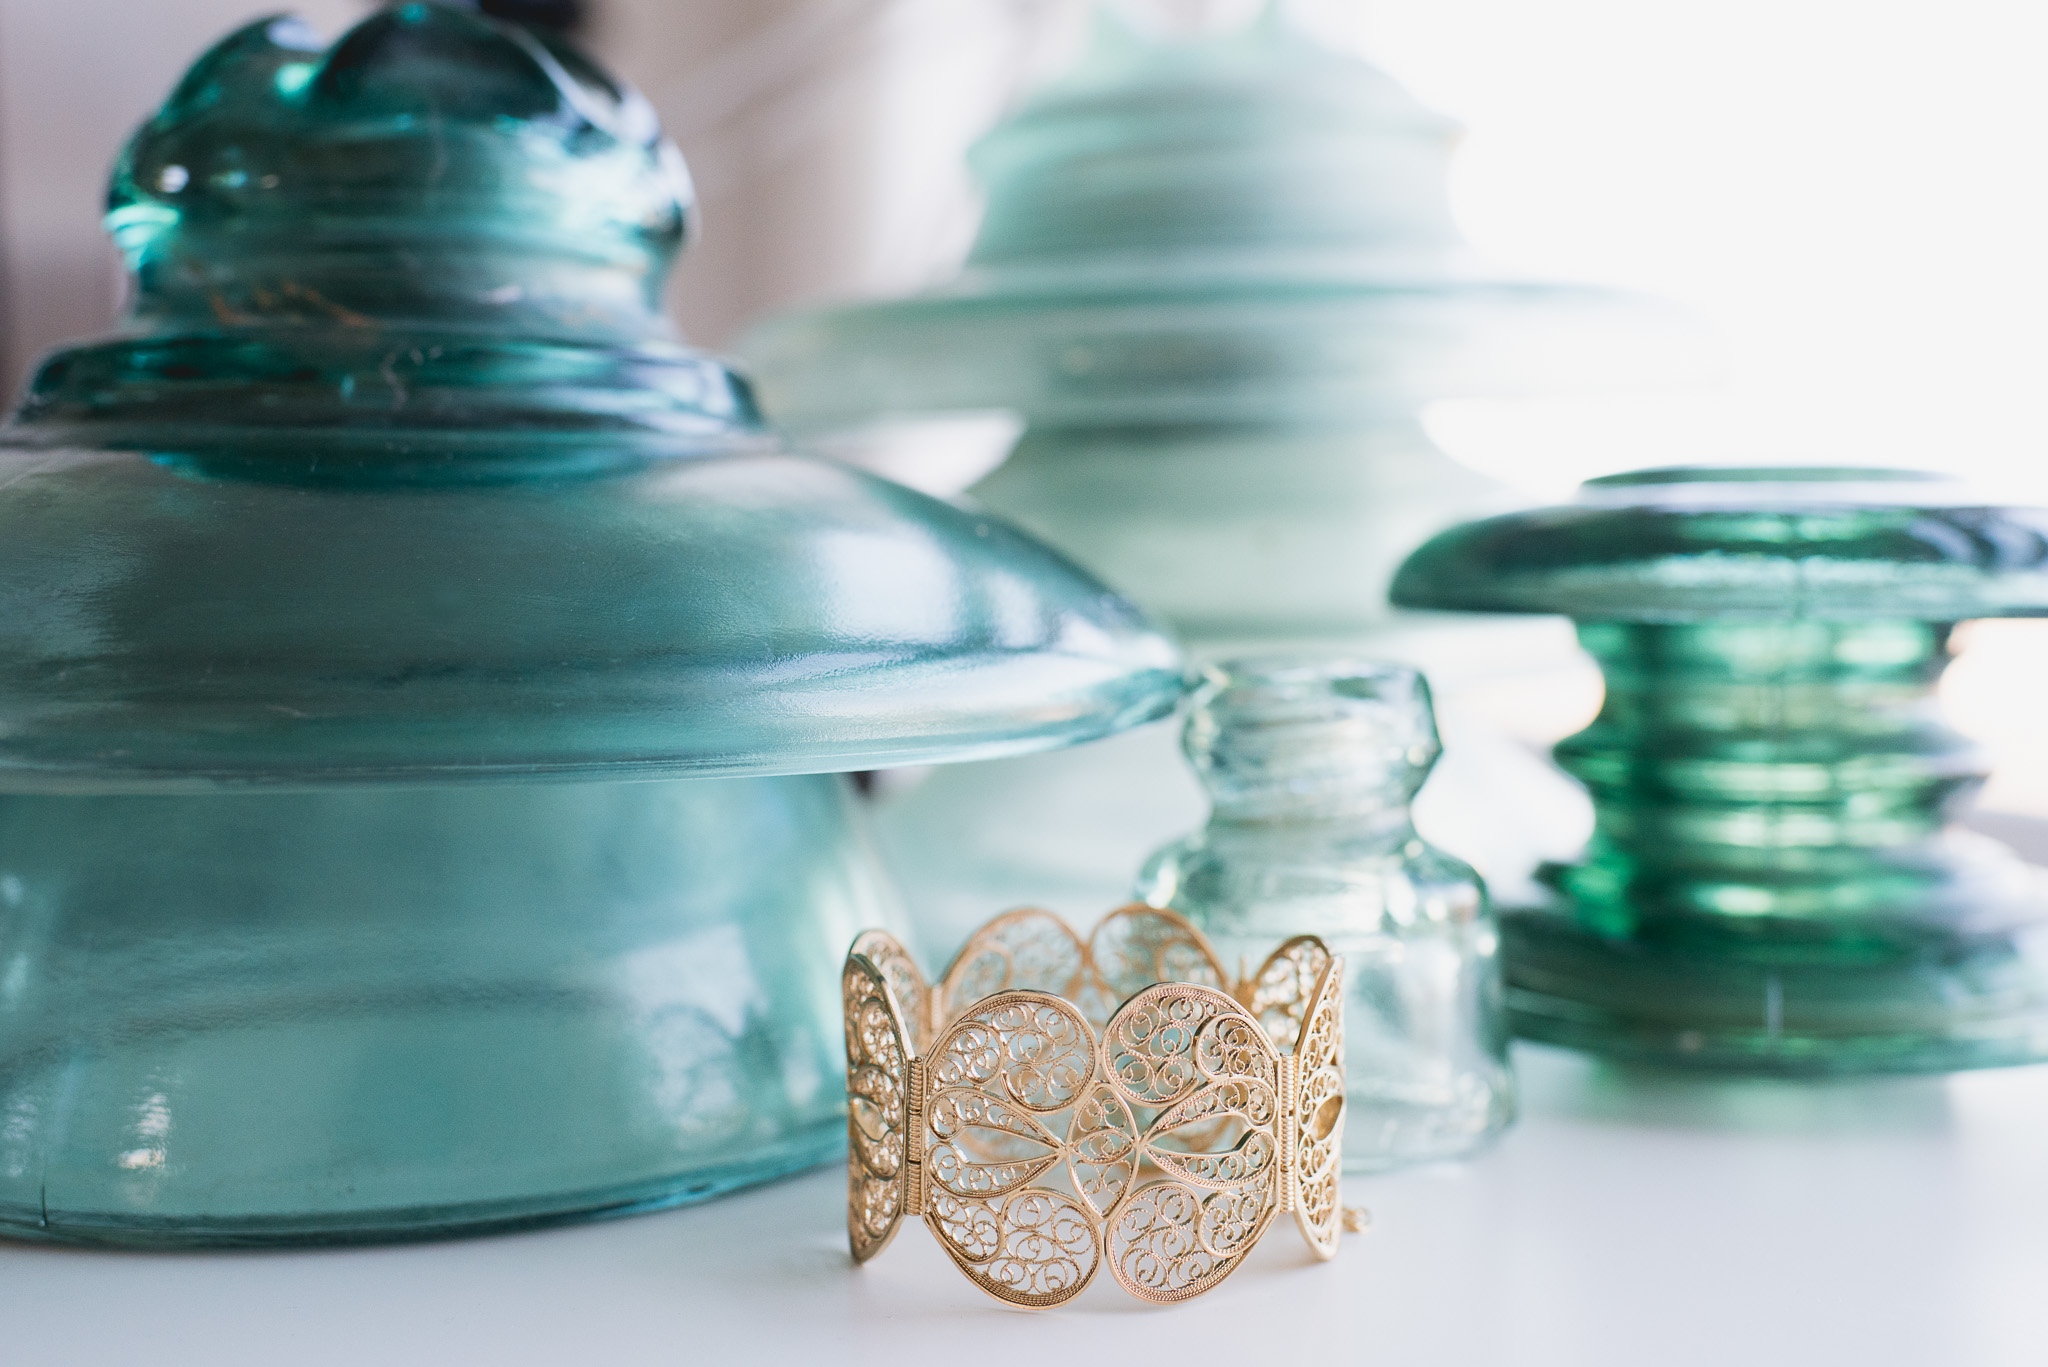 Arabel_Lebrusan_Jewellery_Emma_Hare_Photography__Ethical_Engagement_Rings-7.jpg